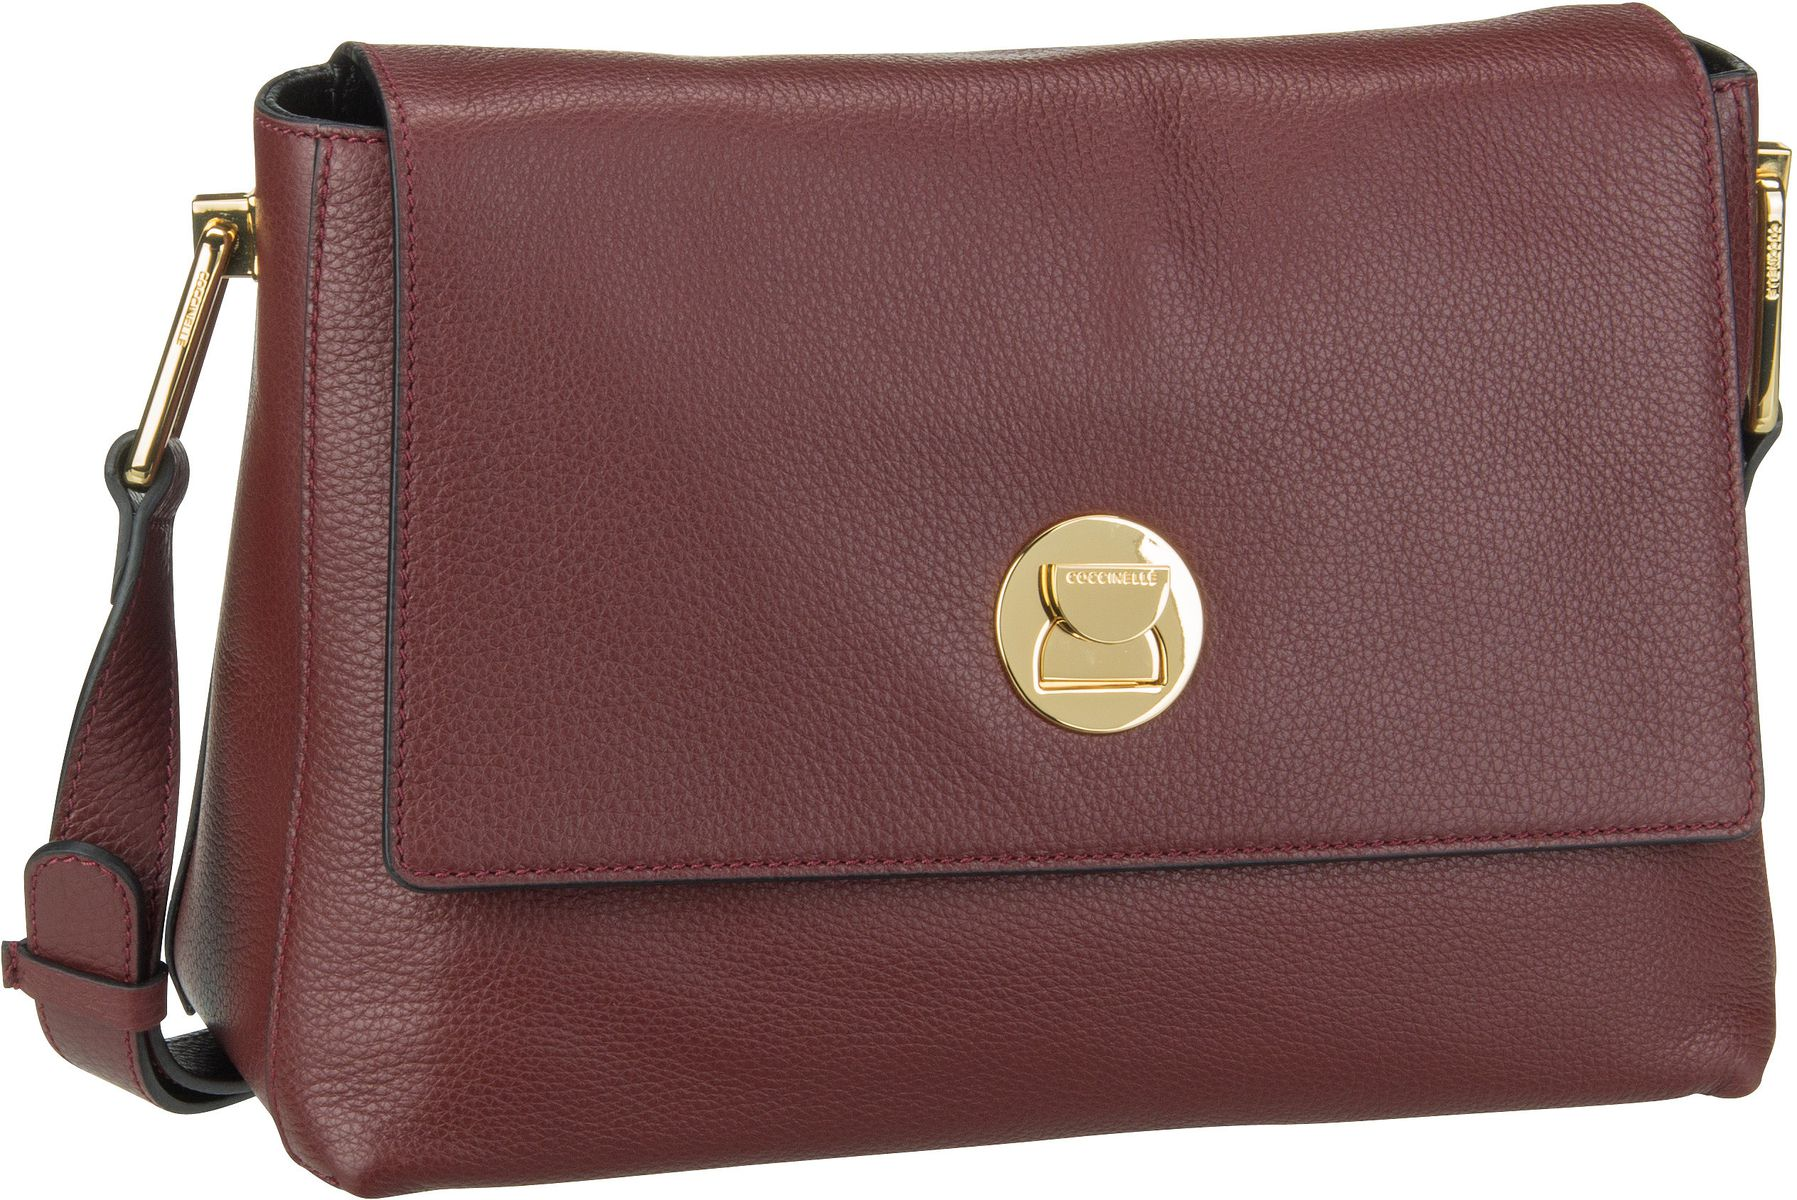 Handtasche Liya 1205 Marsala/Nero